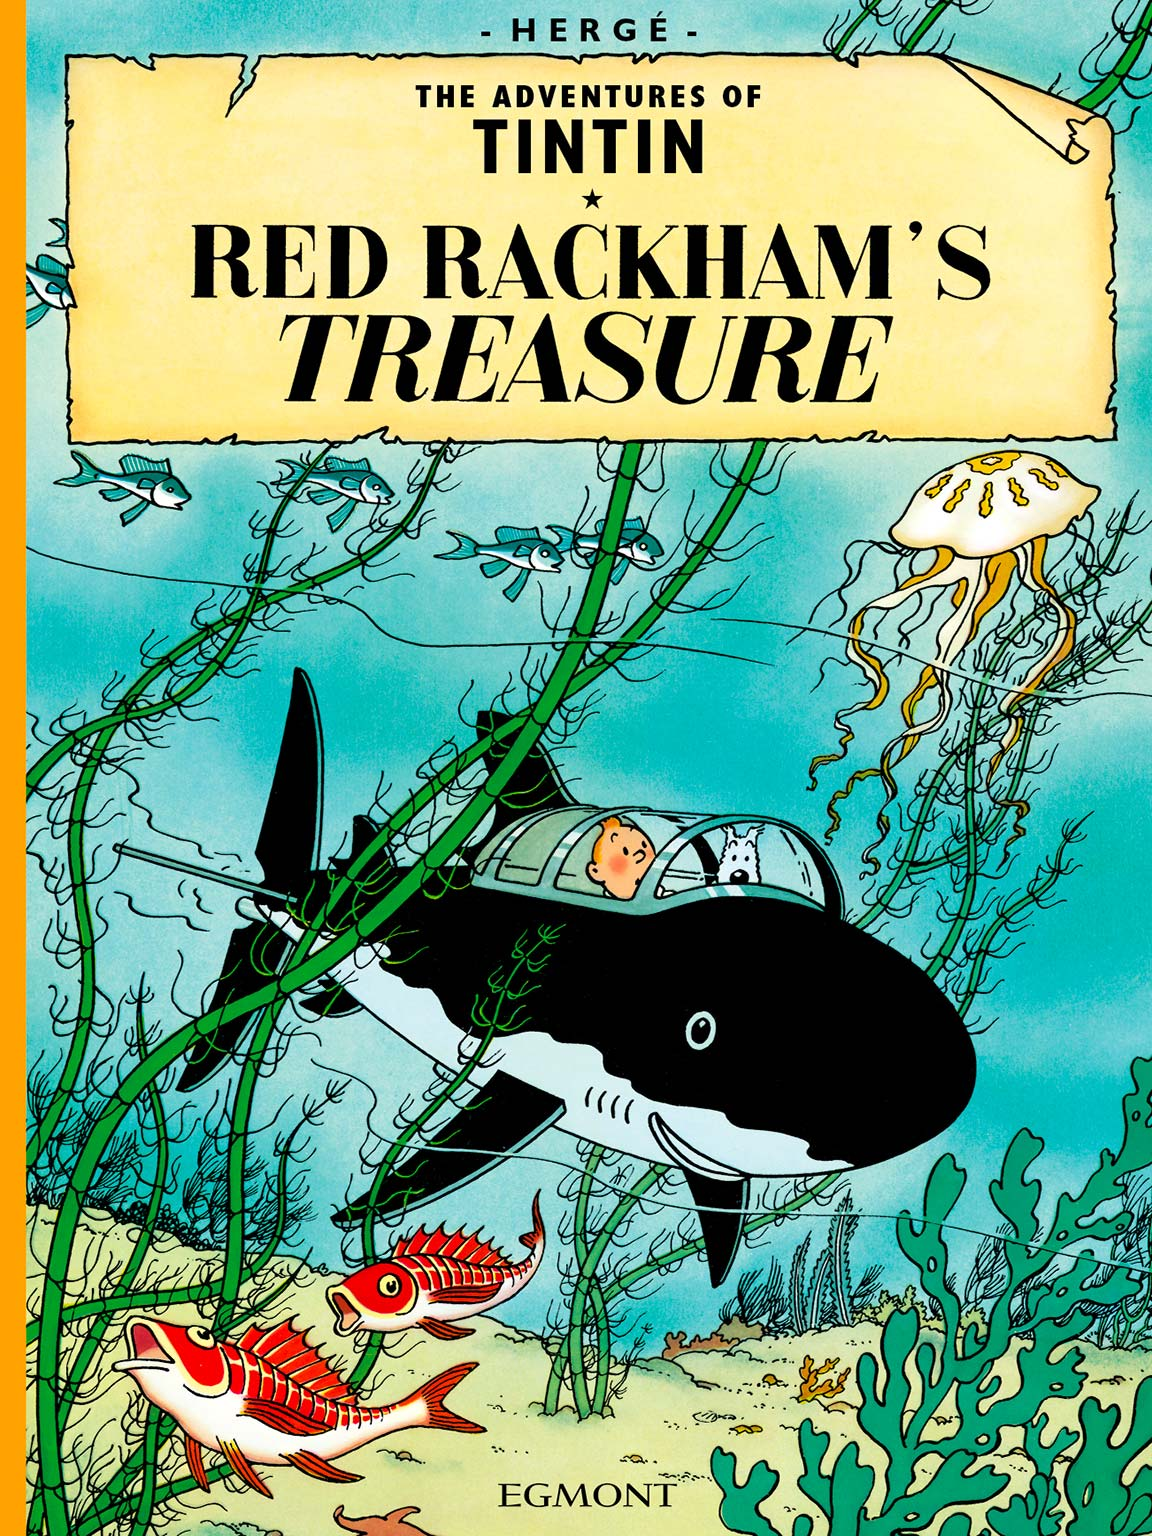 Red Rackham's Treasure - Cover